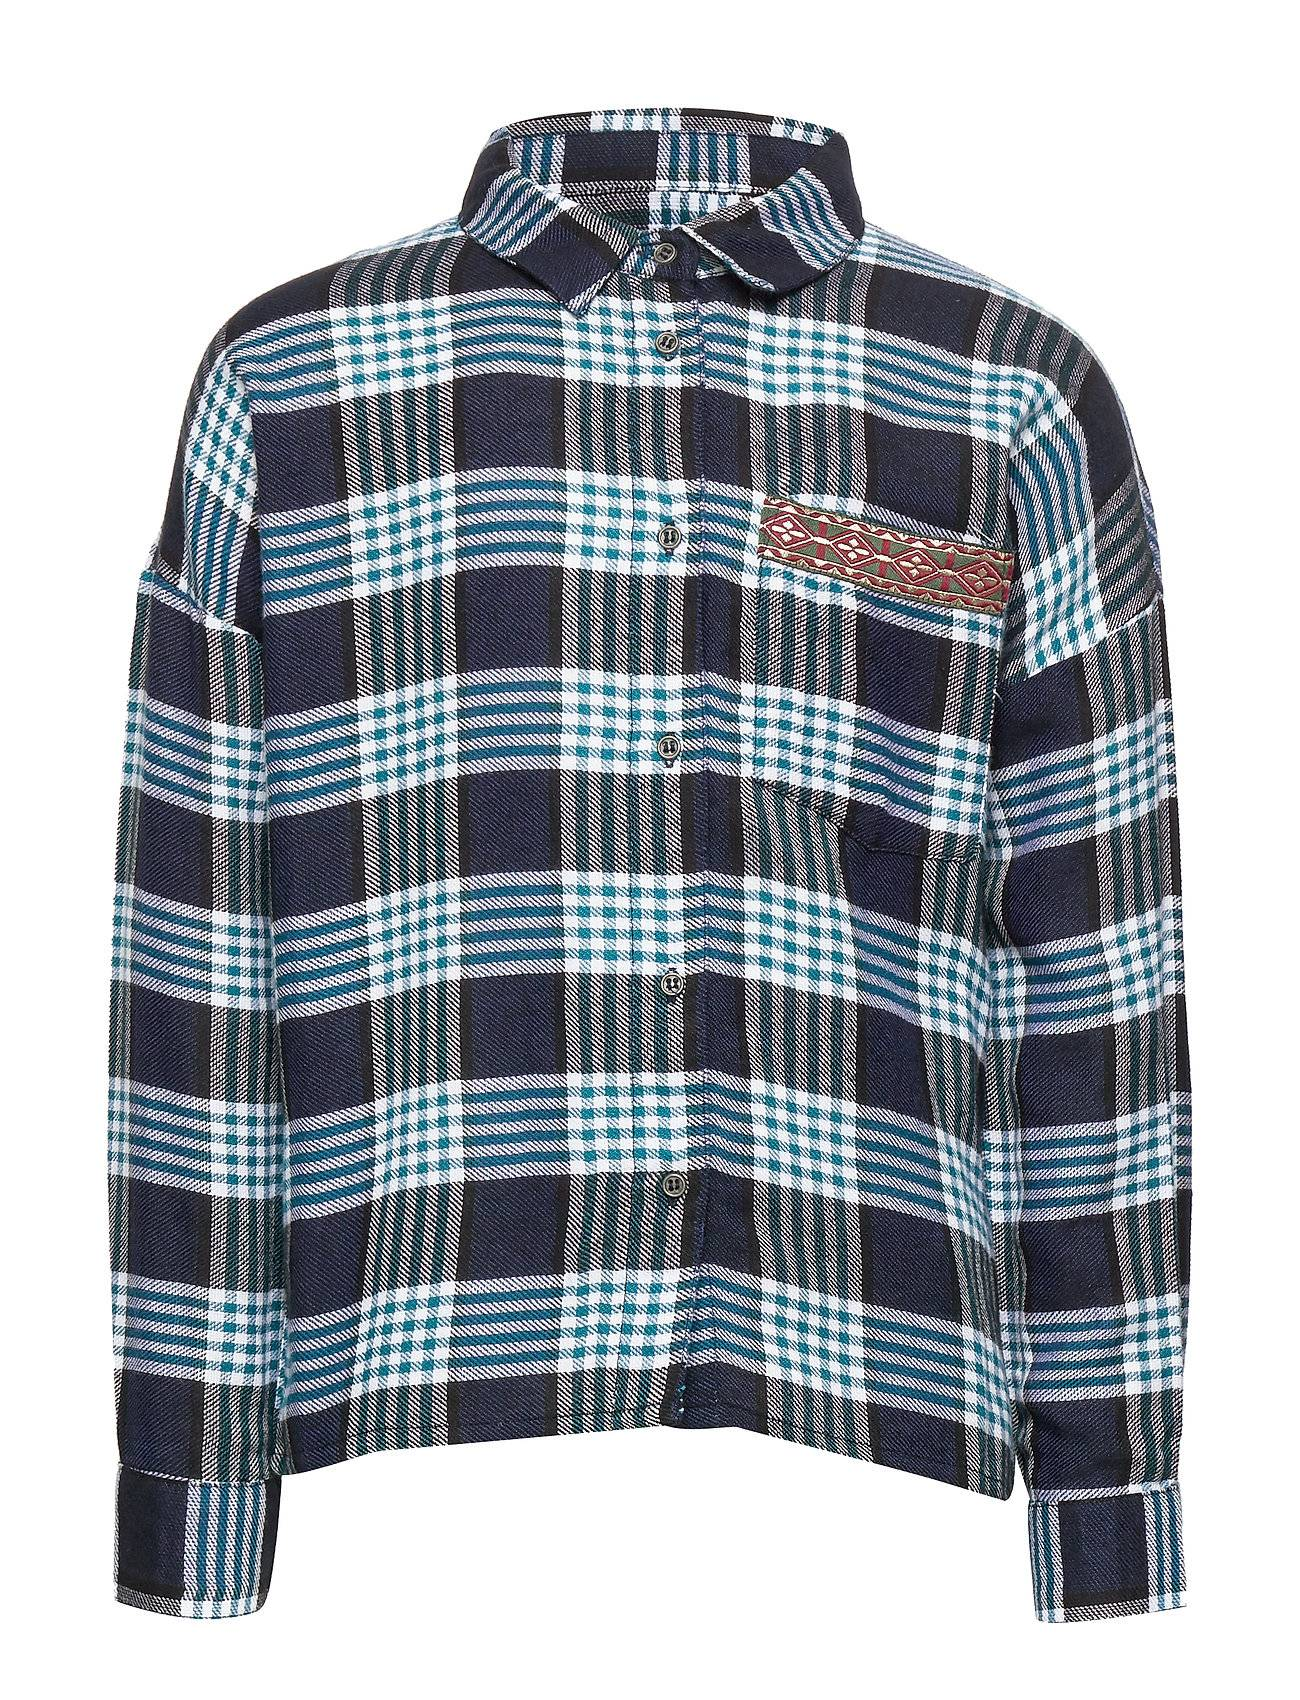 Kids Only Konkoda Blue Detail Check Shirt Pnt Paita Sininen Kids Only